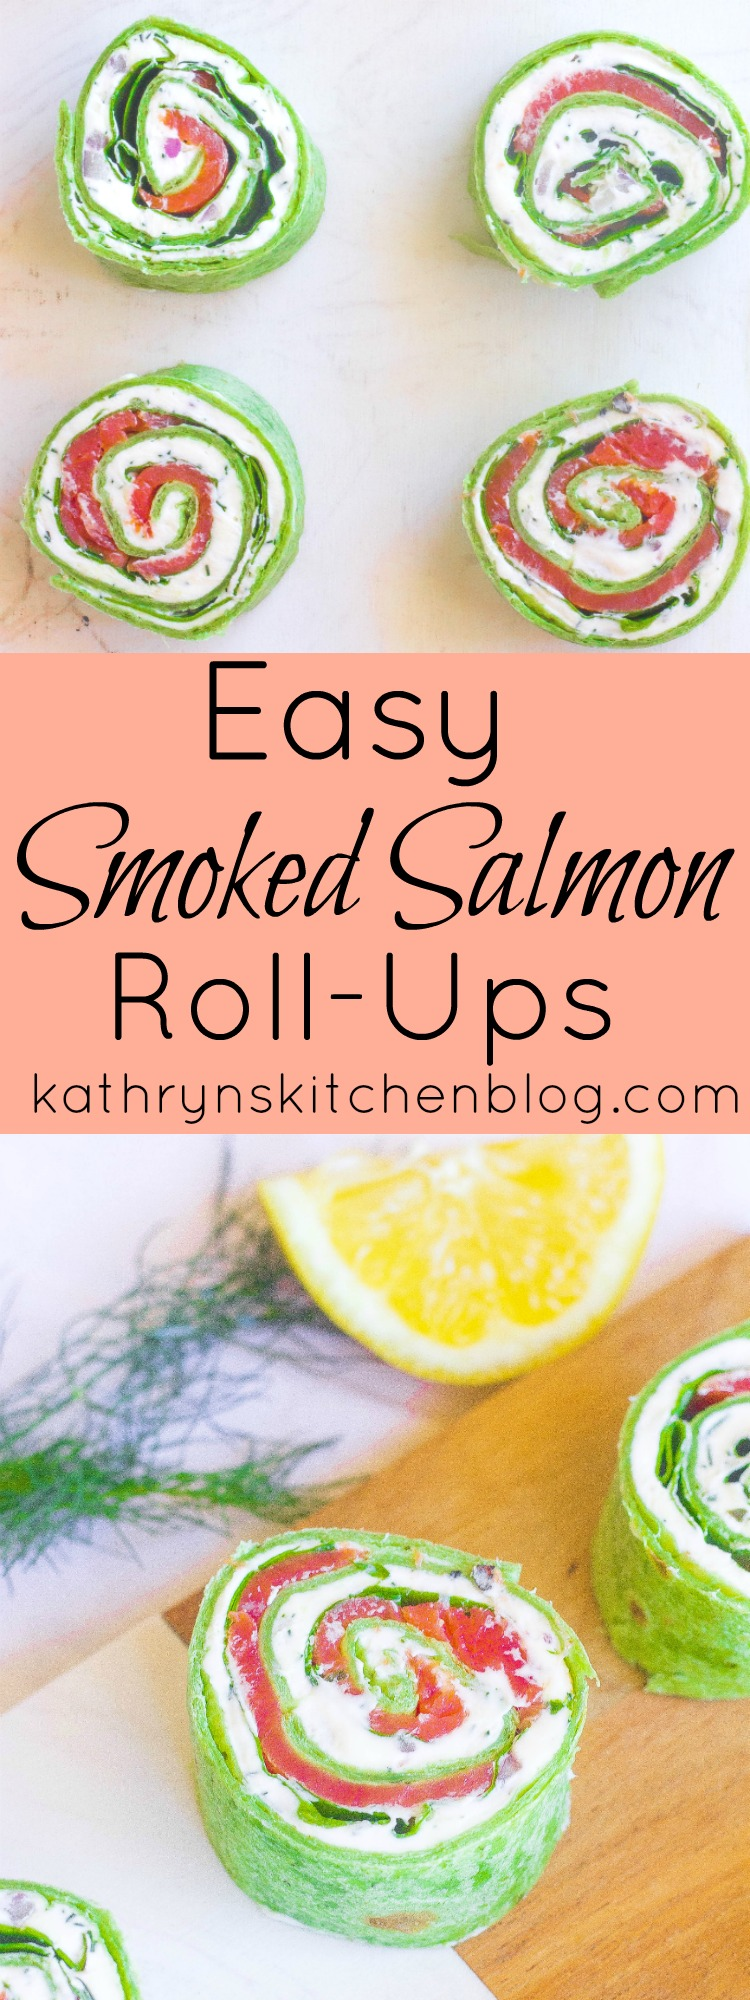 Easy Smoked Salmon Roll-Ups